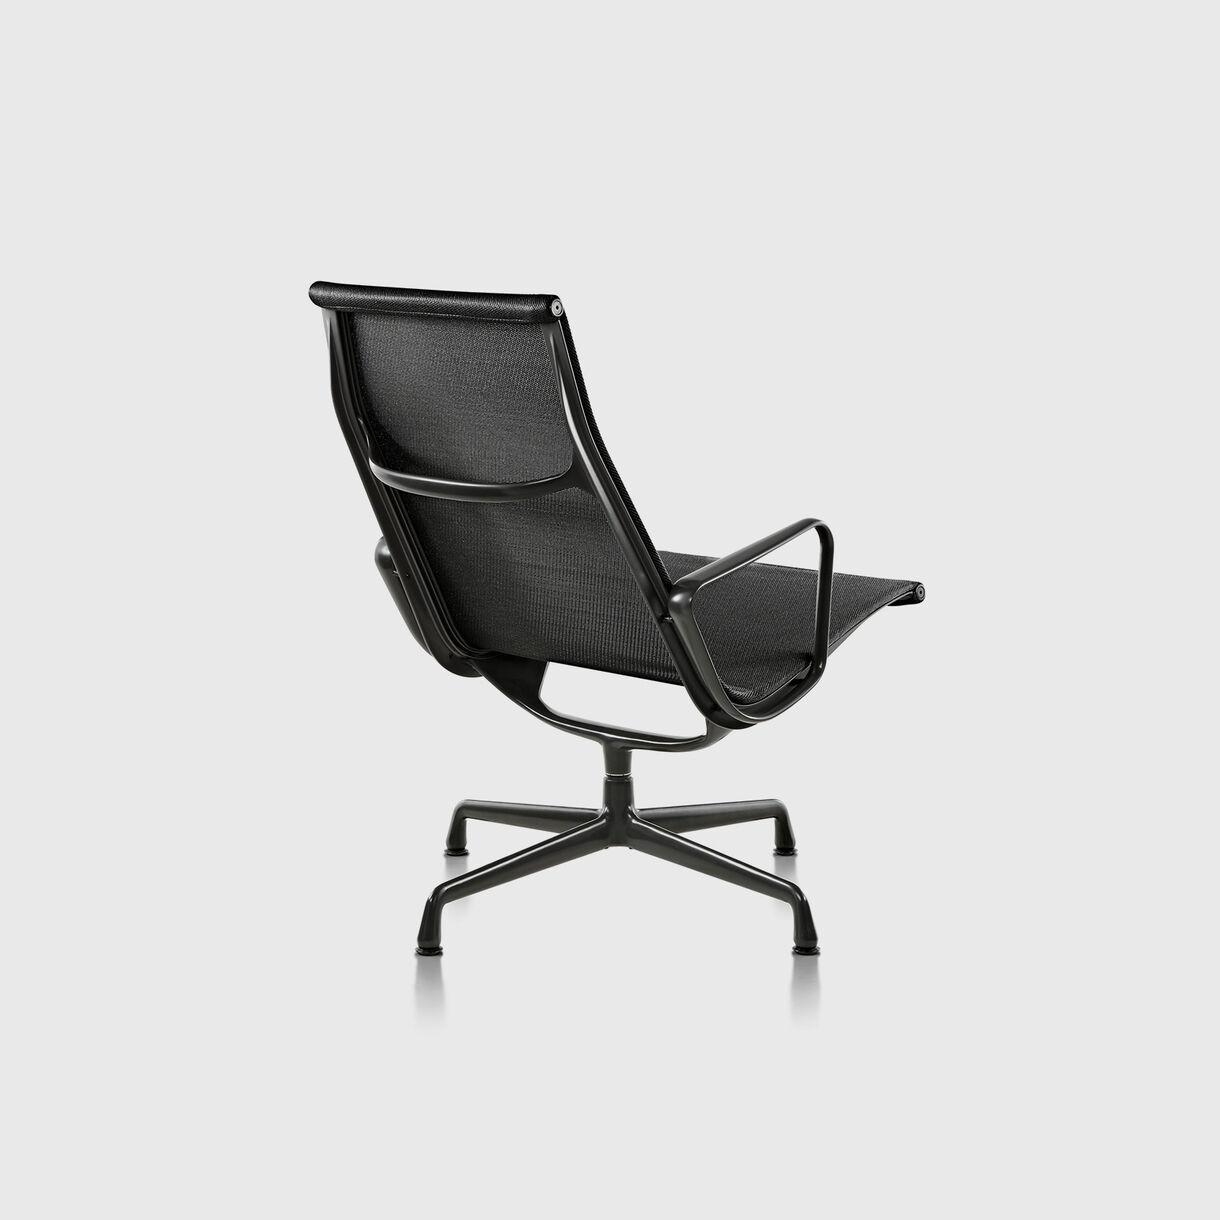 Eames Aluminium Group Outdoor Lounge Chair